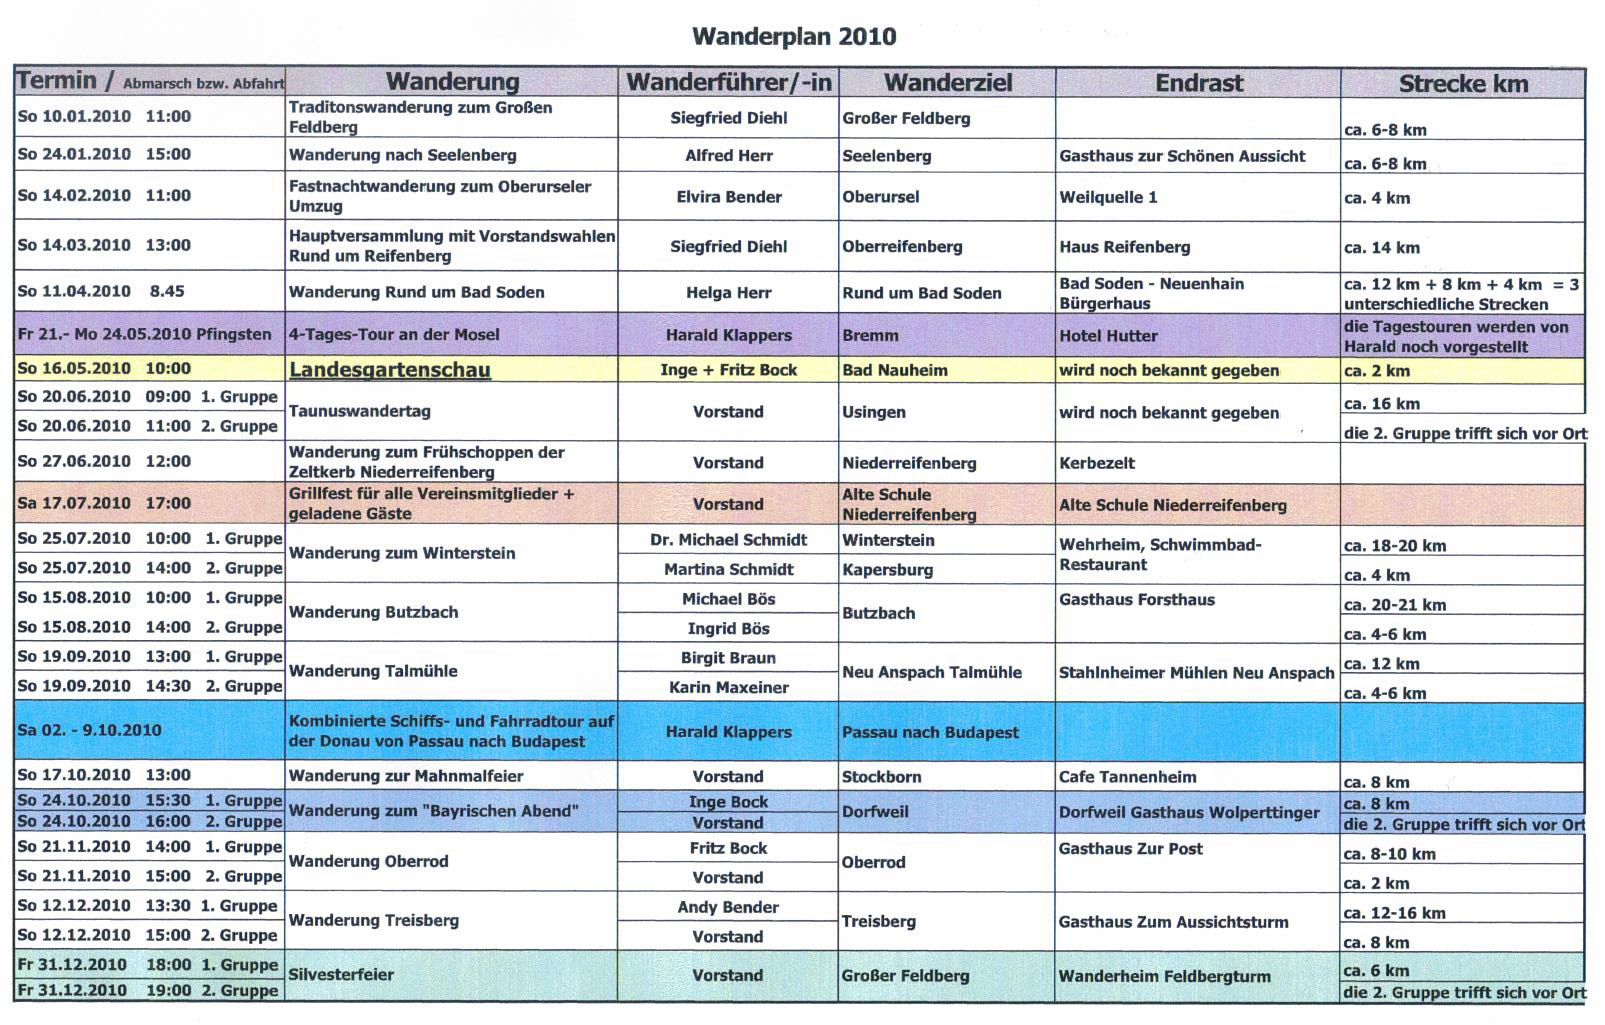 Wanderplan 2010